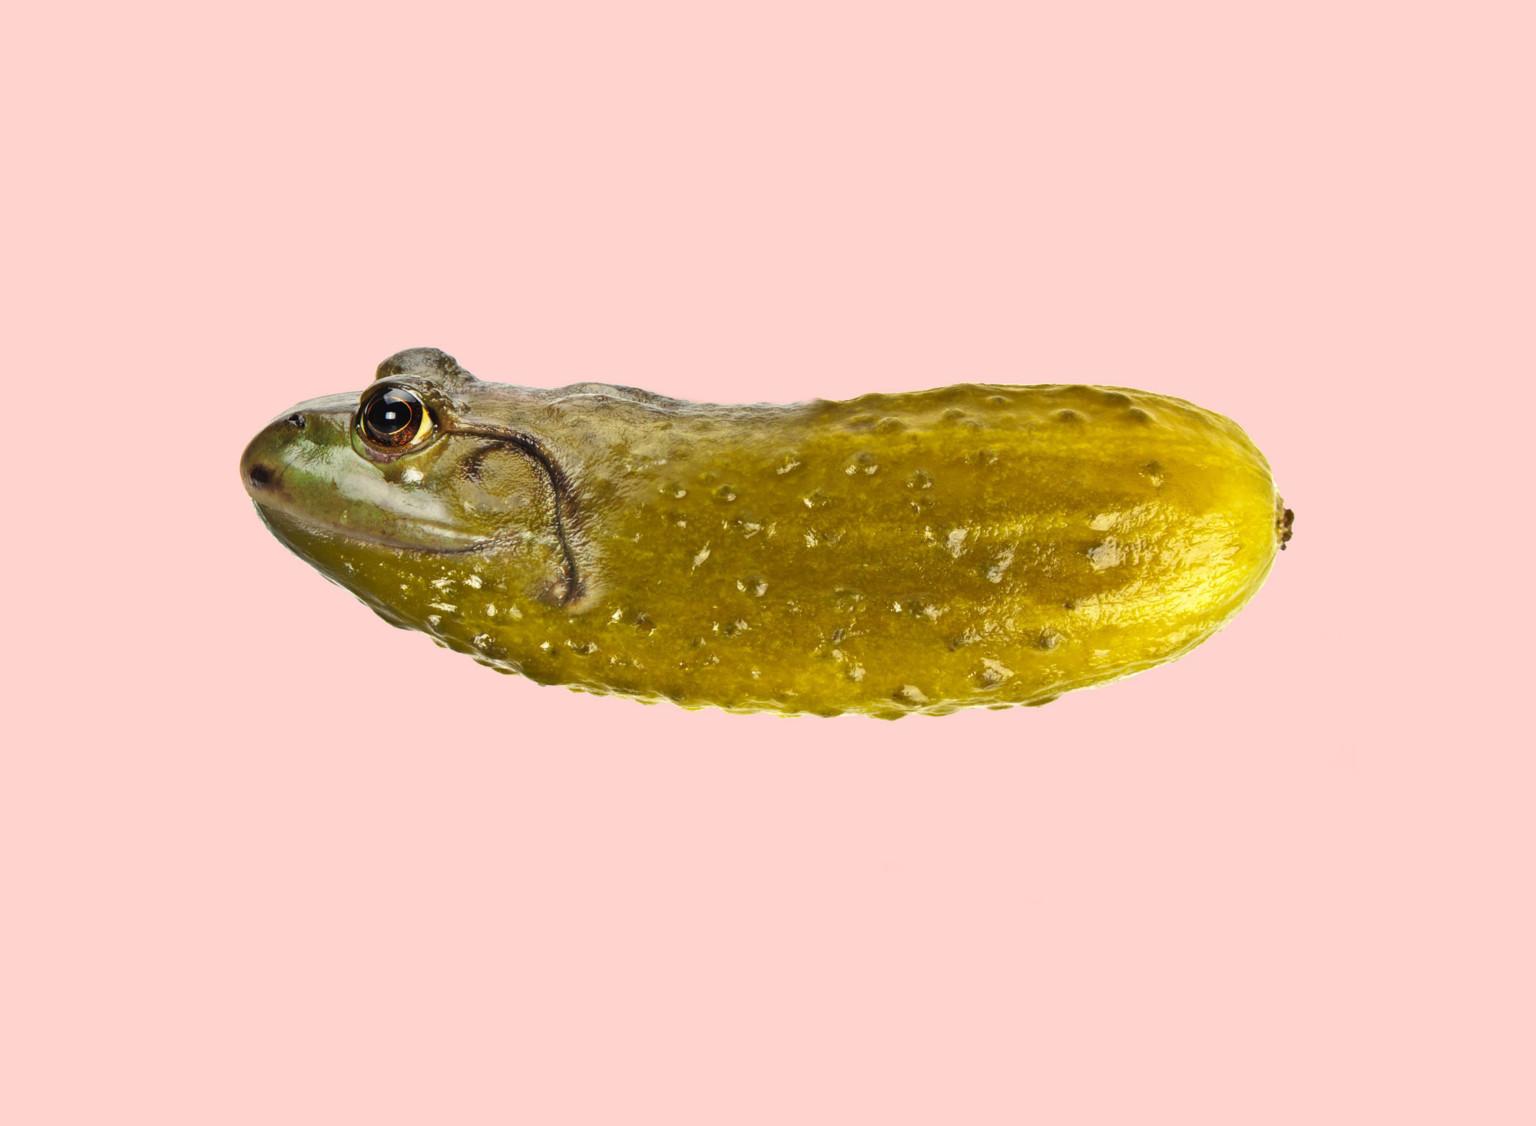 cucumber-frog-768x563@2x